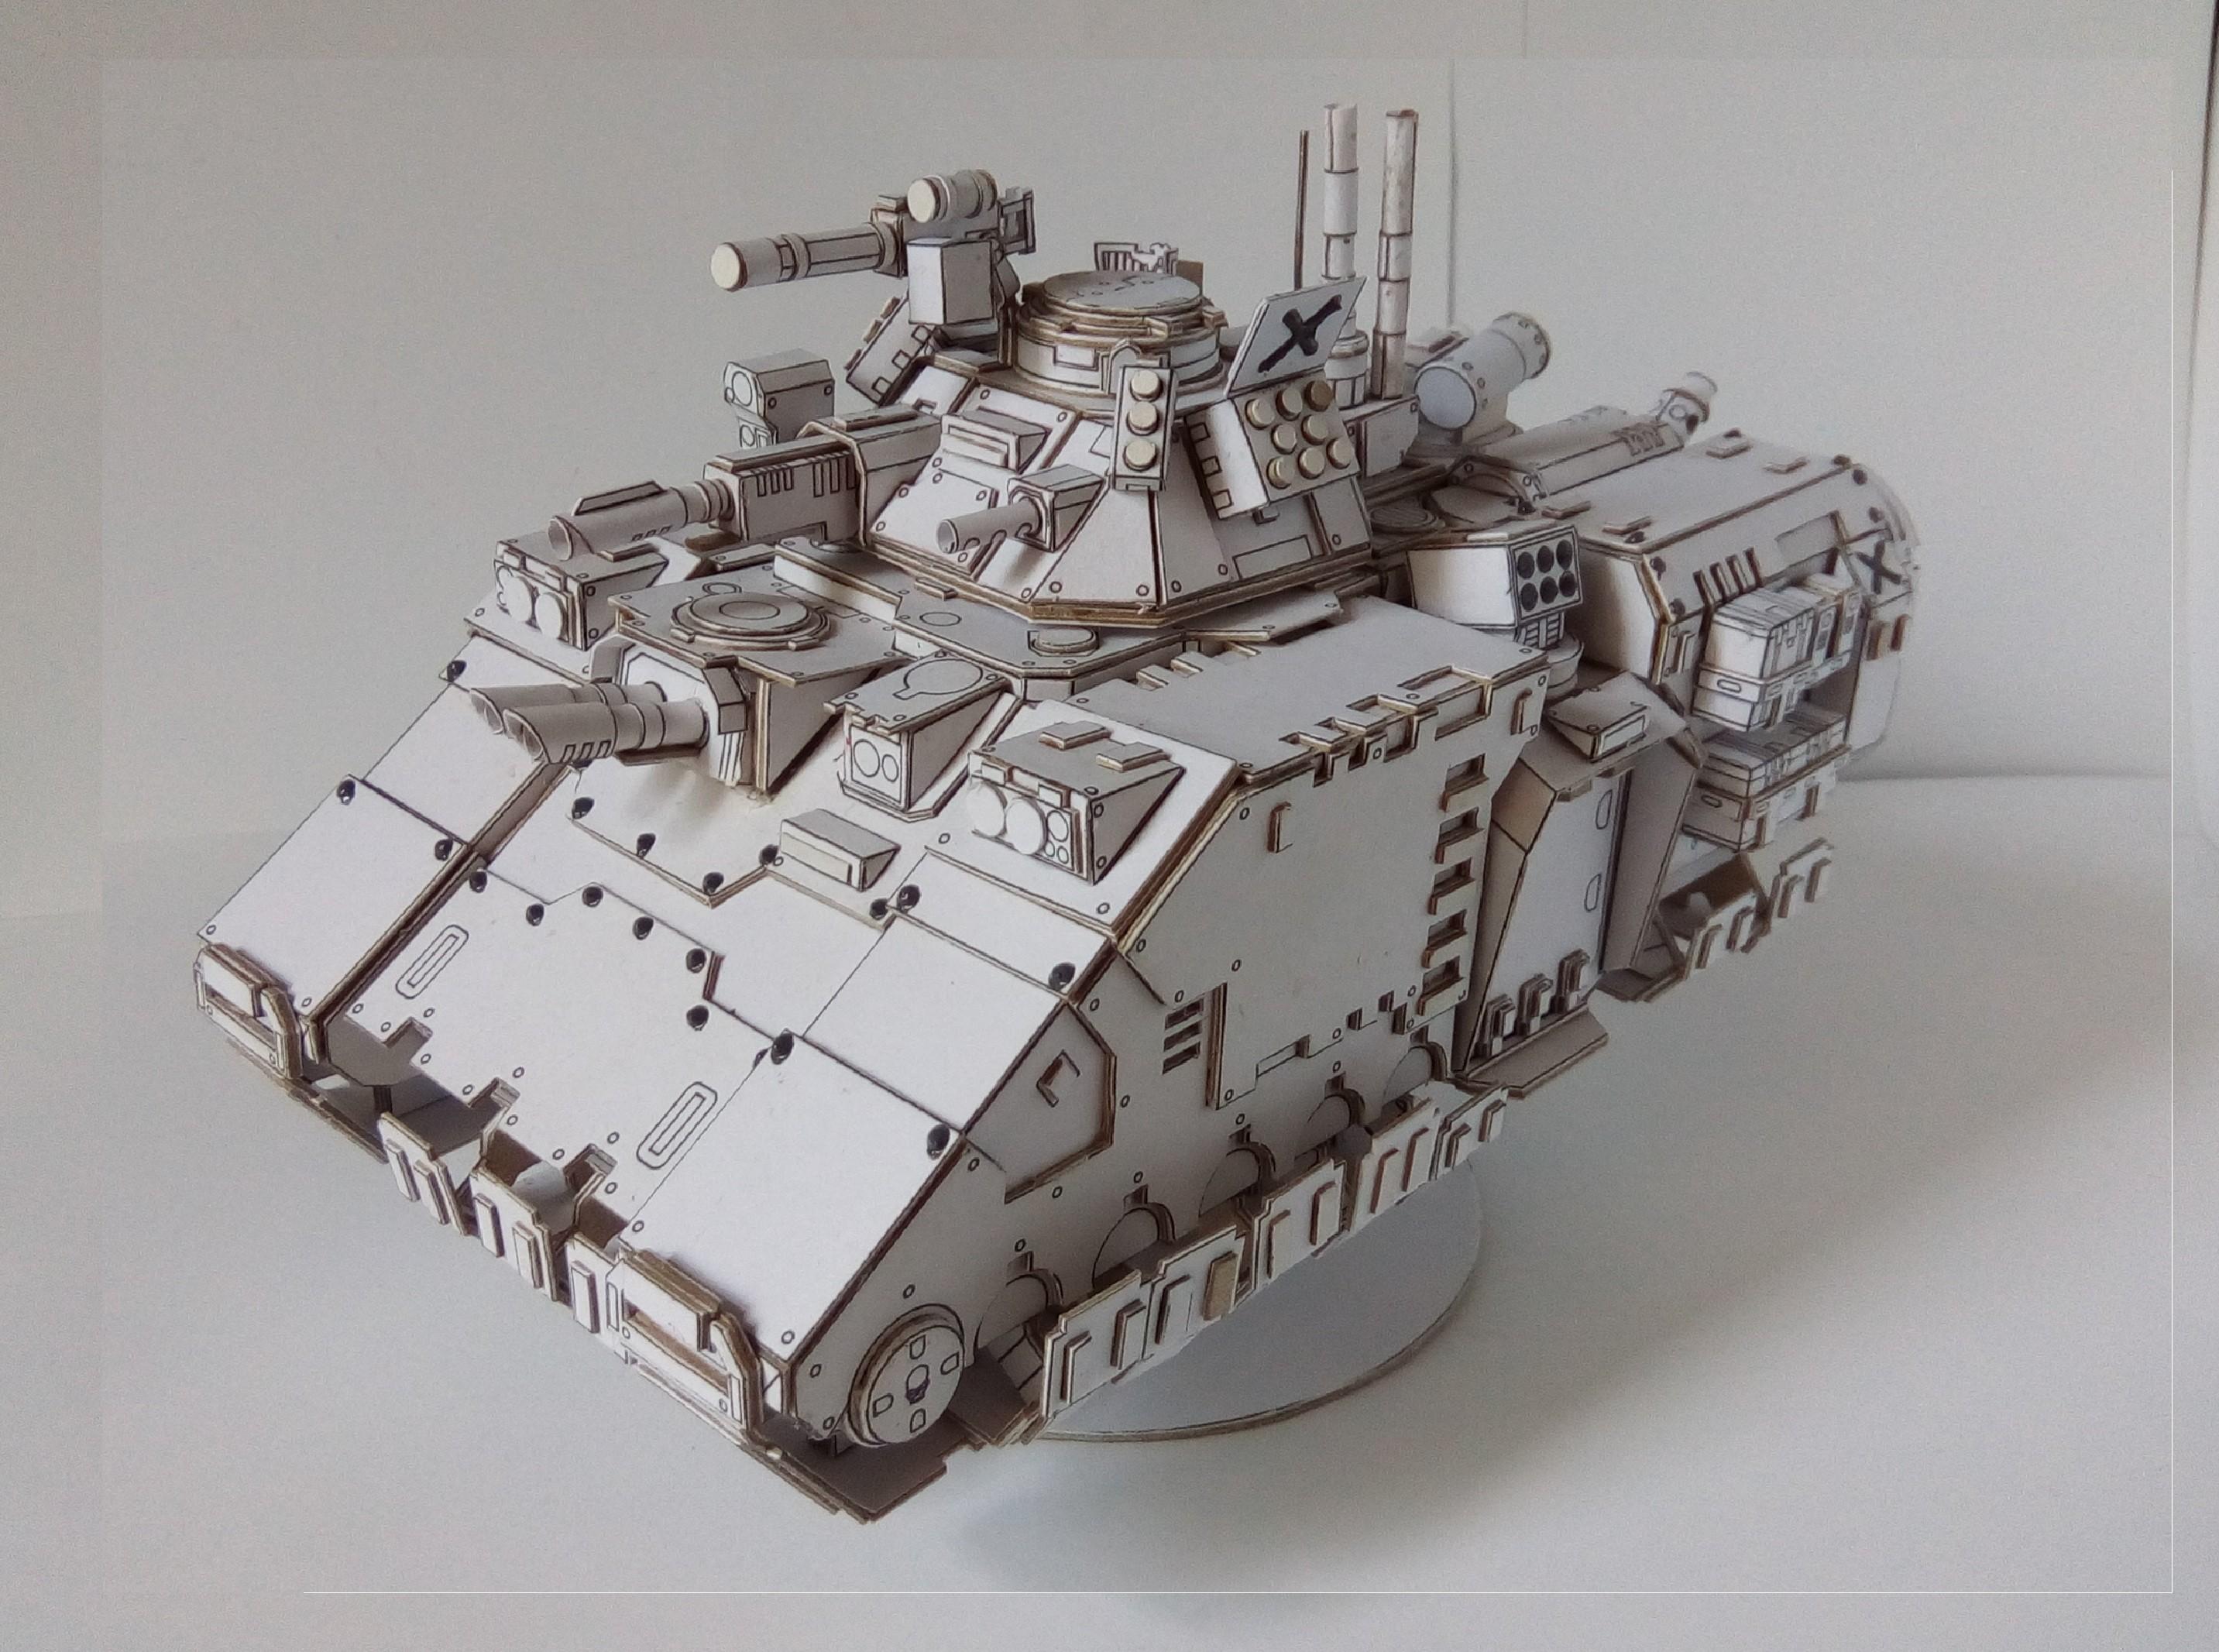 Warhammer 40k Papercraft Тестовая сборка бумажного Primaris Repulsor видео Wh Papercraft